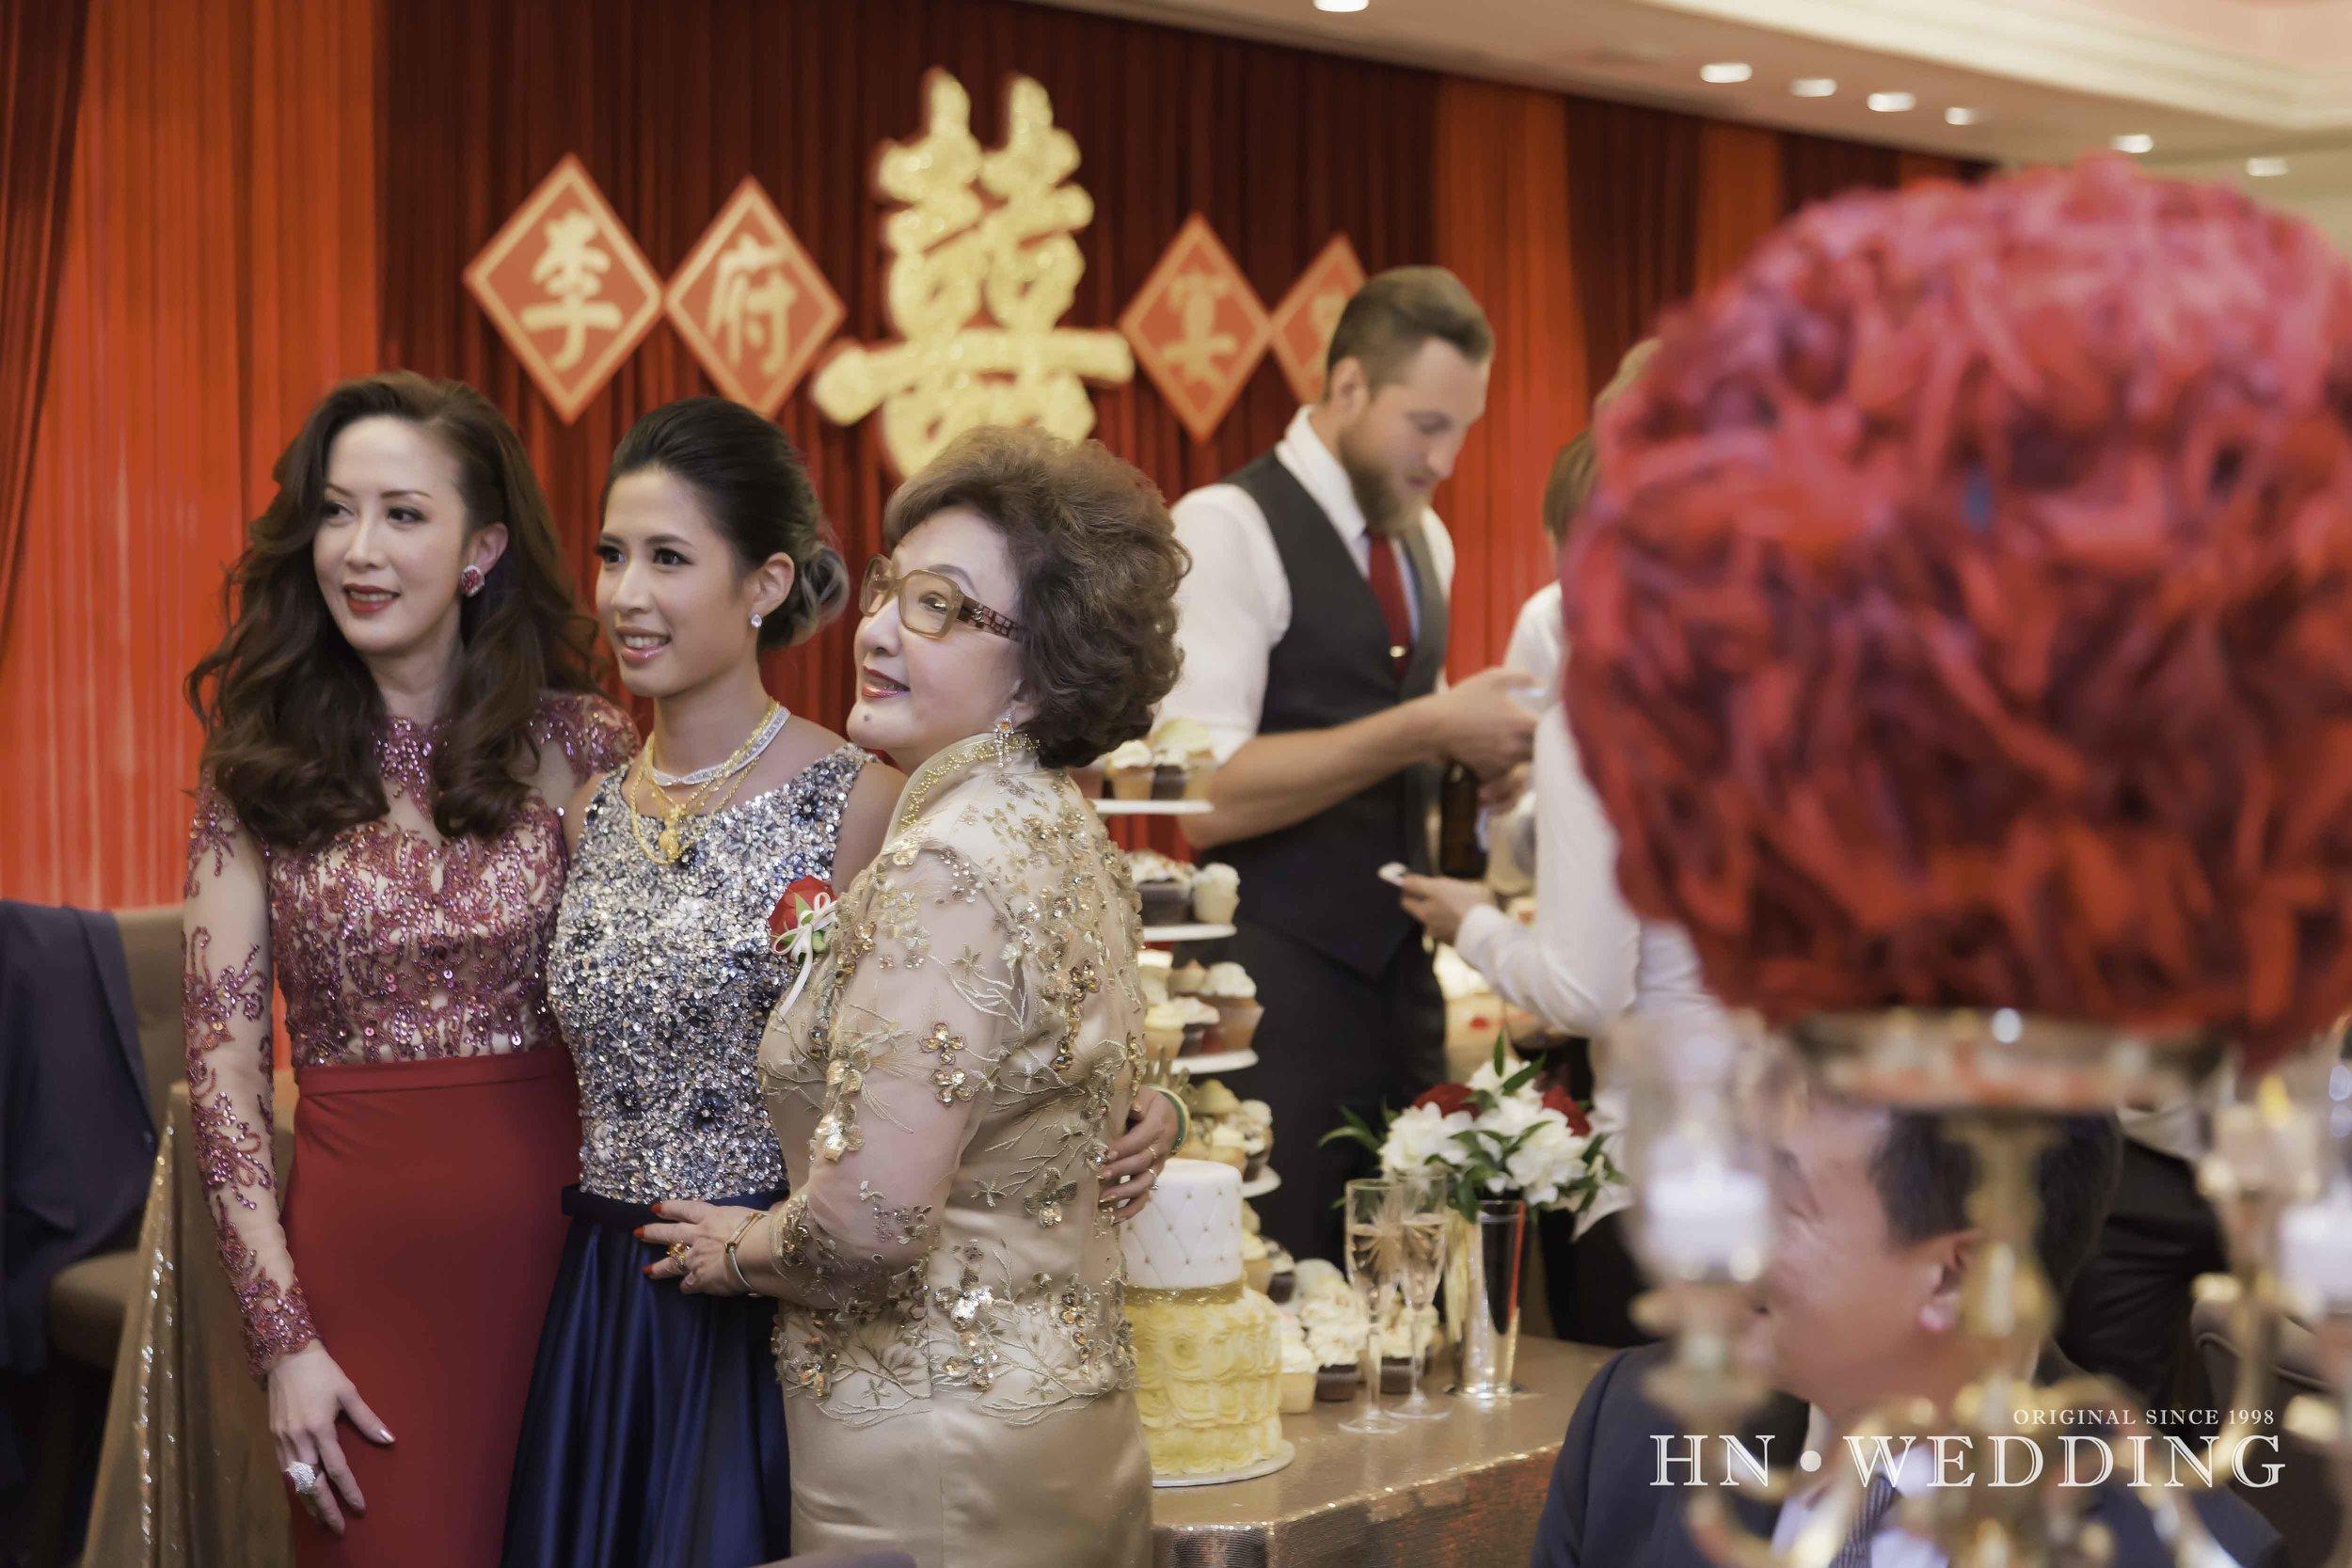 HNwedding-20160815-wedding-042.jpg